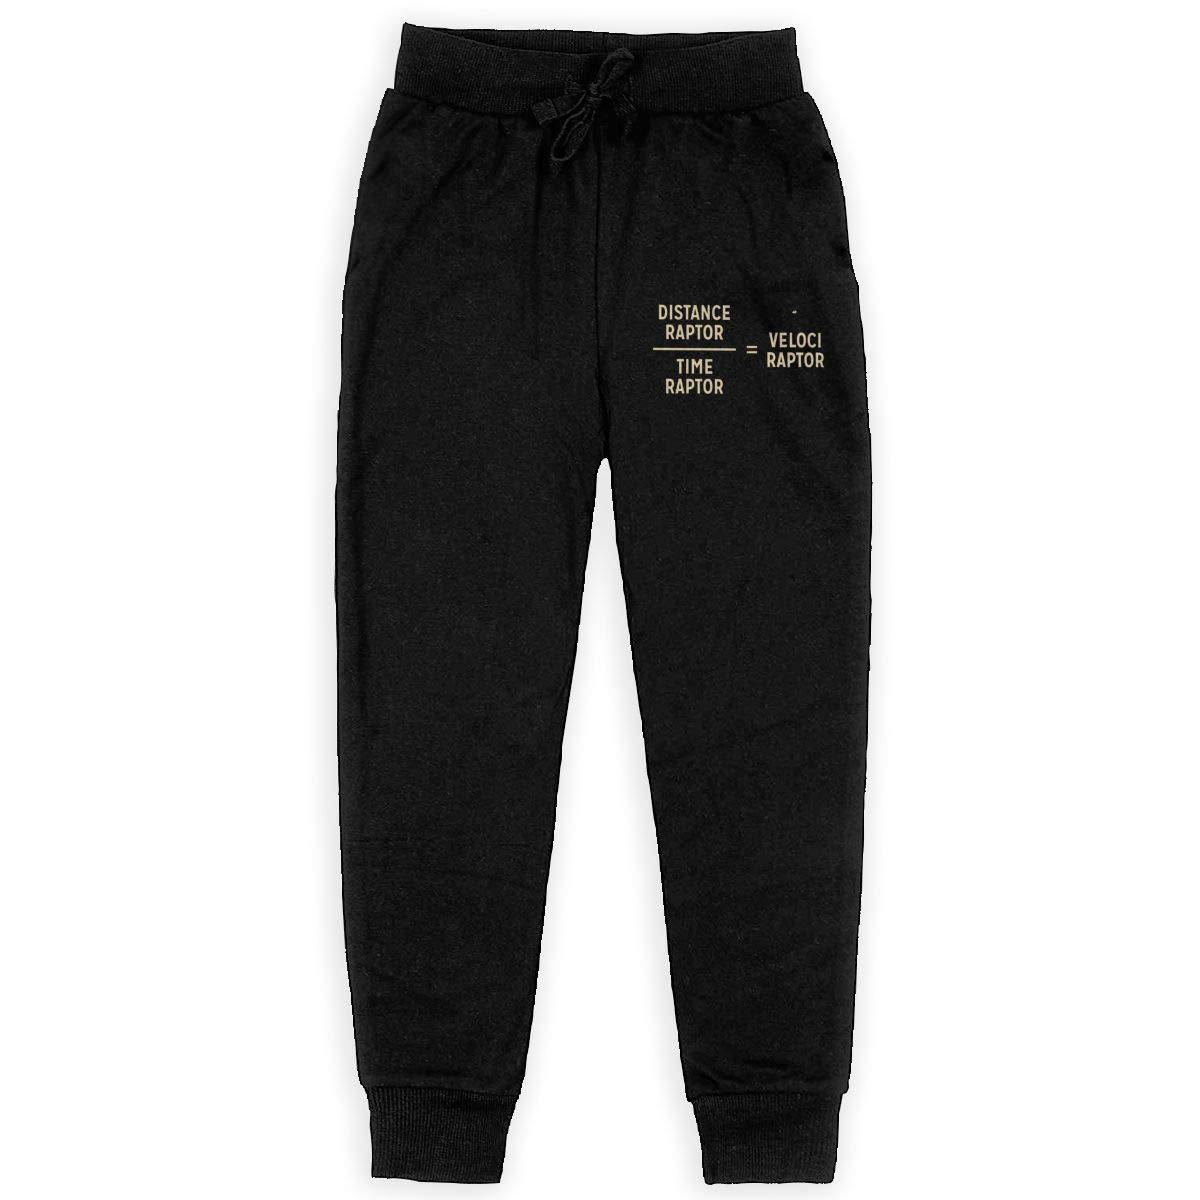 Dunpaiaa VELOCI Raptor Boys Sweatpants,Joggers Sport Training Pants Trousers Black